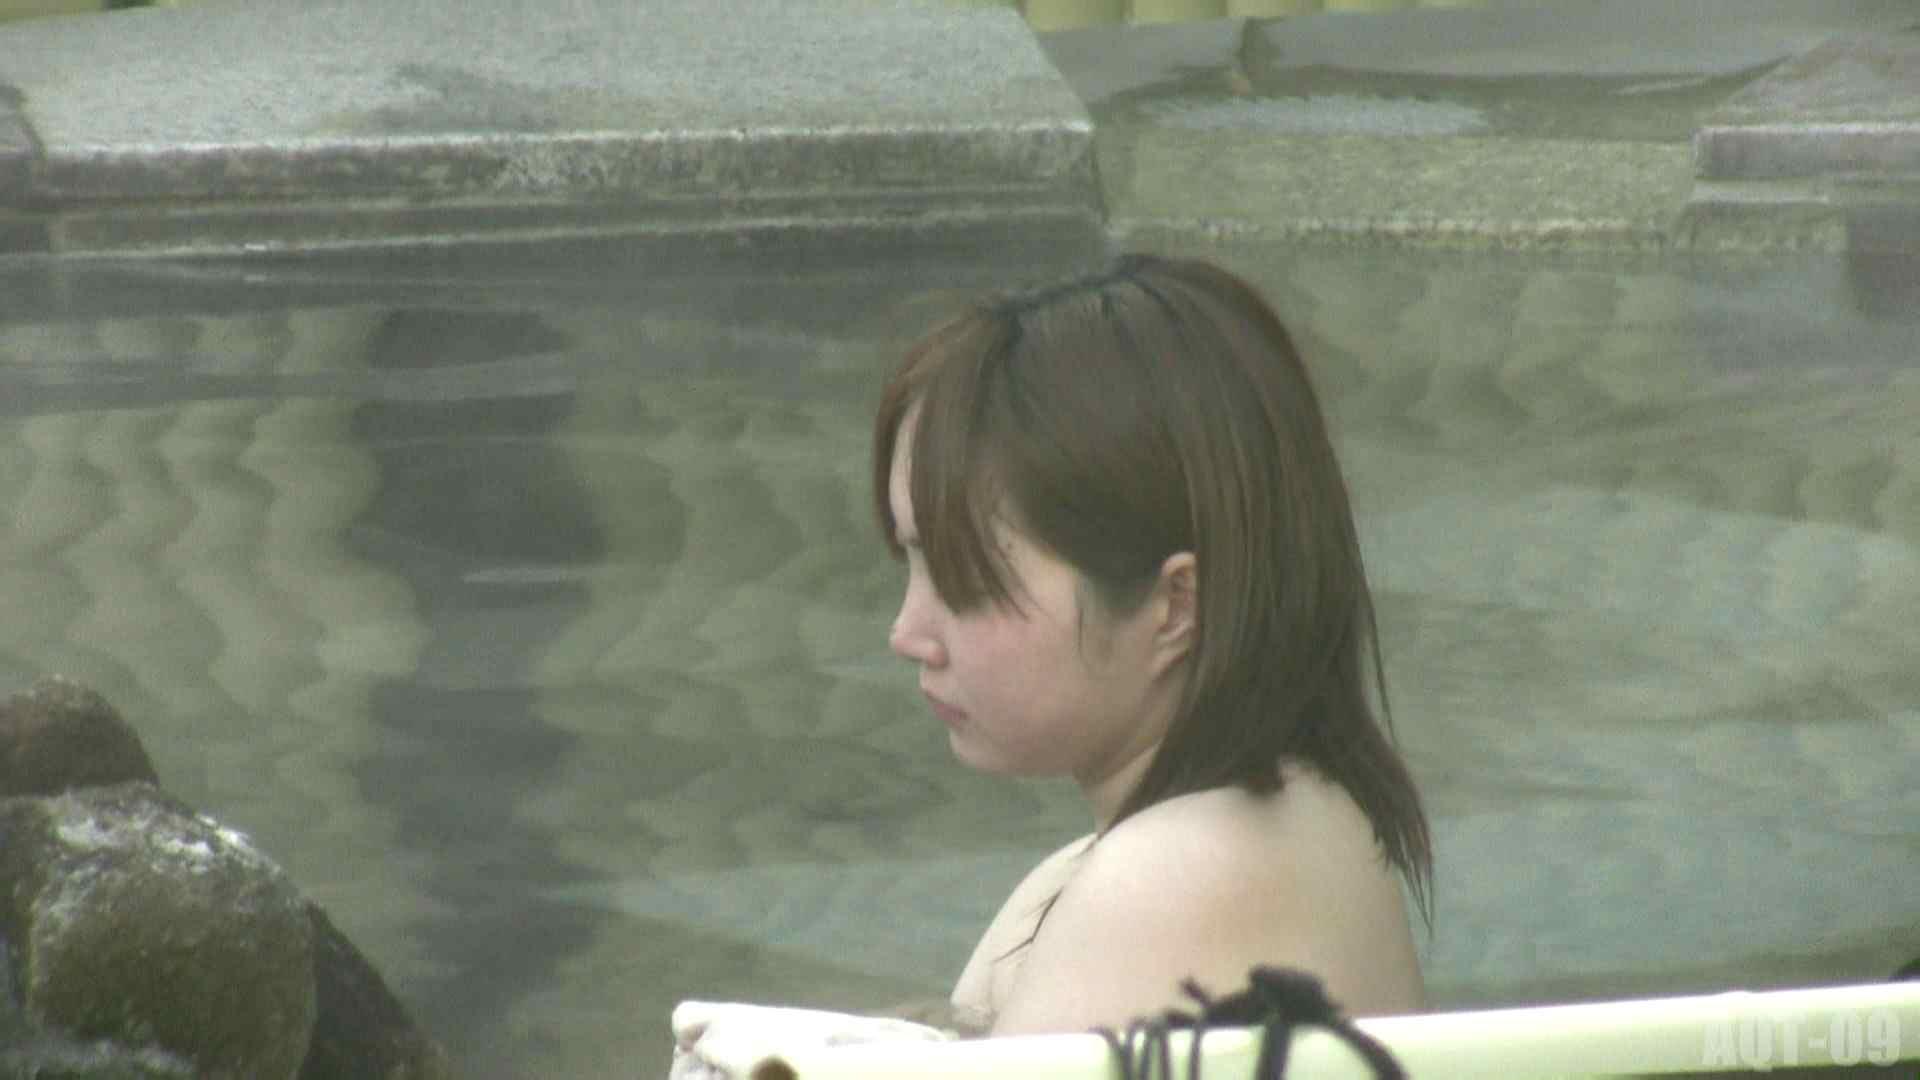 Aquaな露天風呂Vol.781 露天風呂   OLのエロ生活  93連発 43